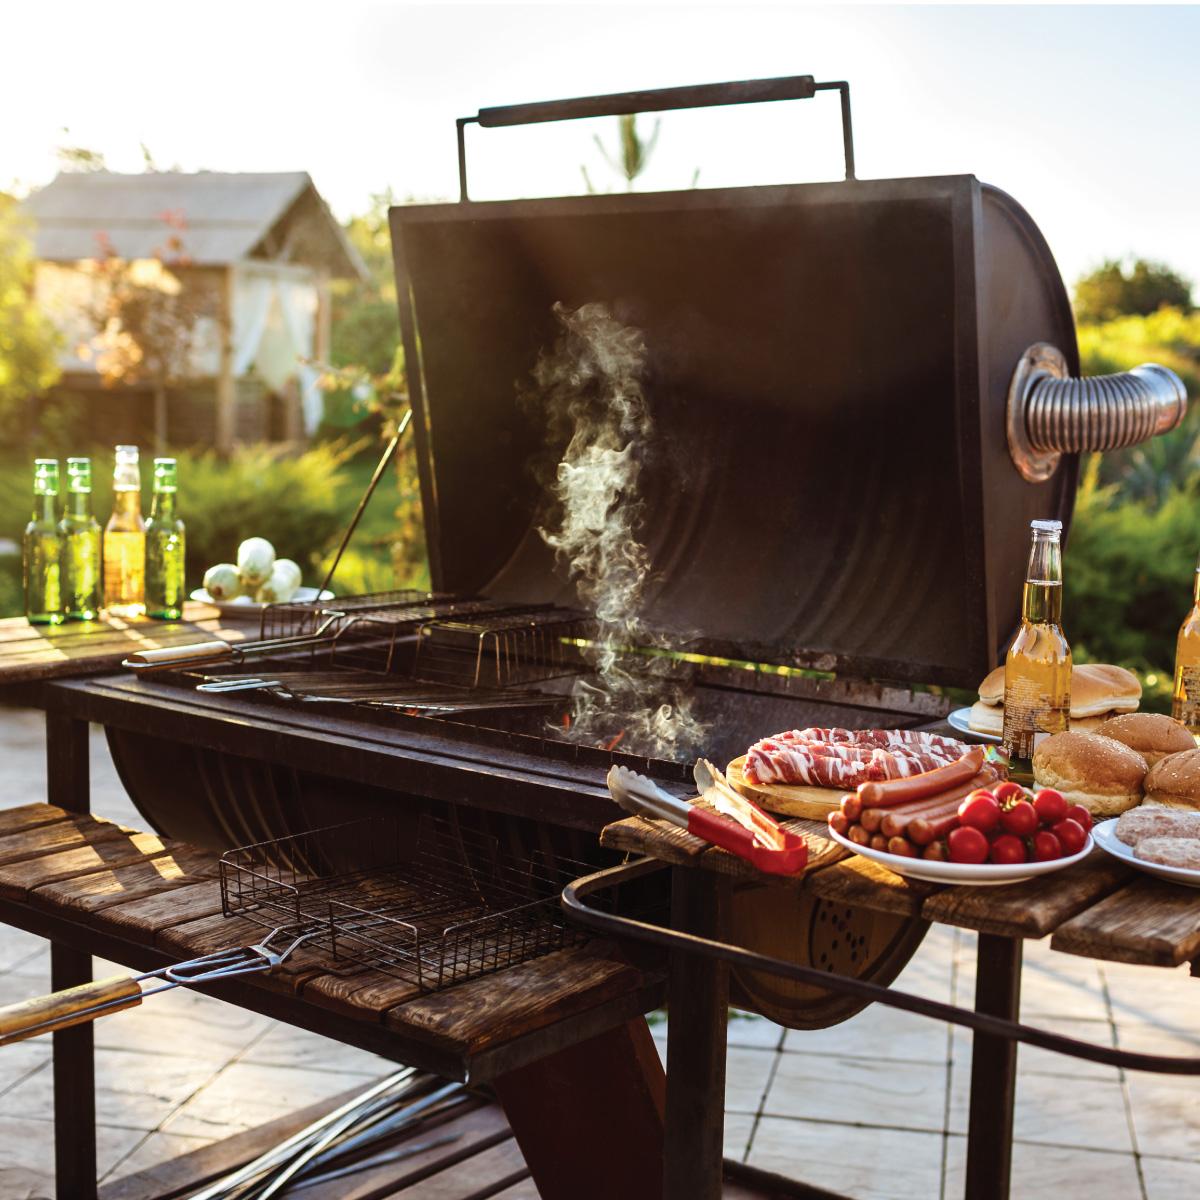 BBQ Summer Hampers